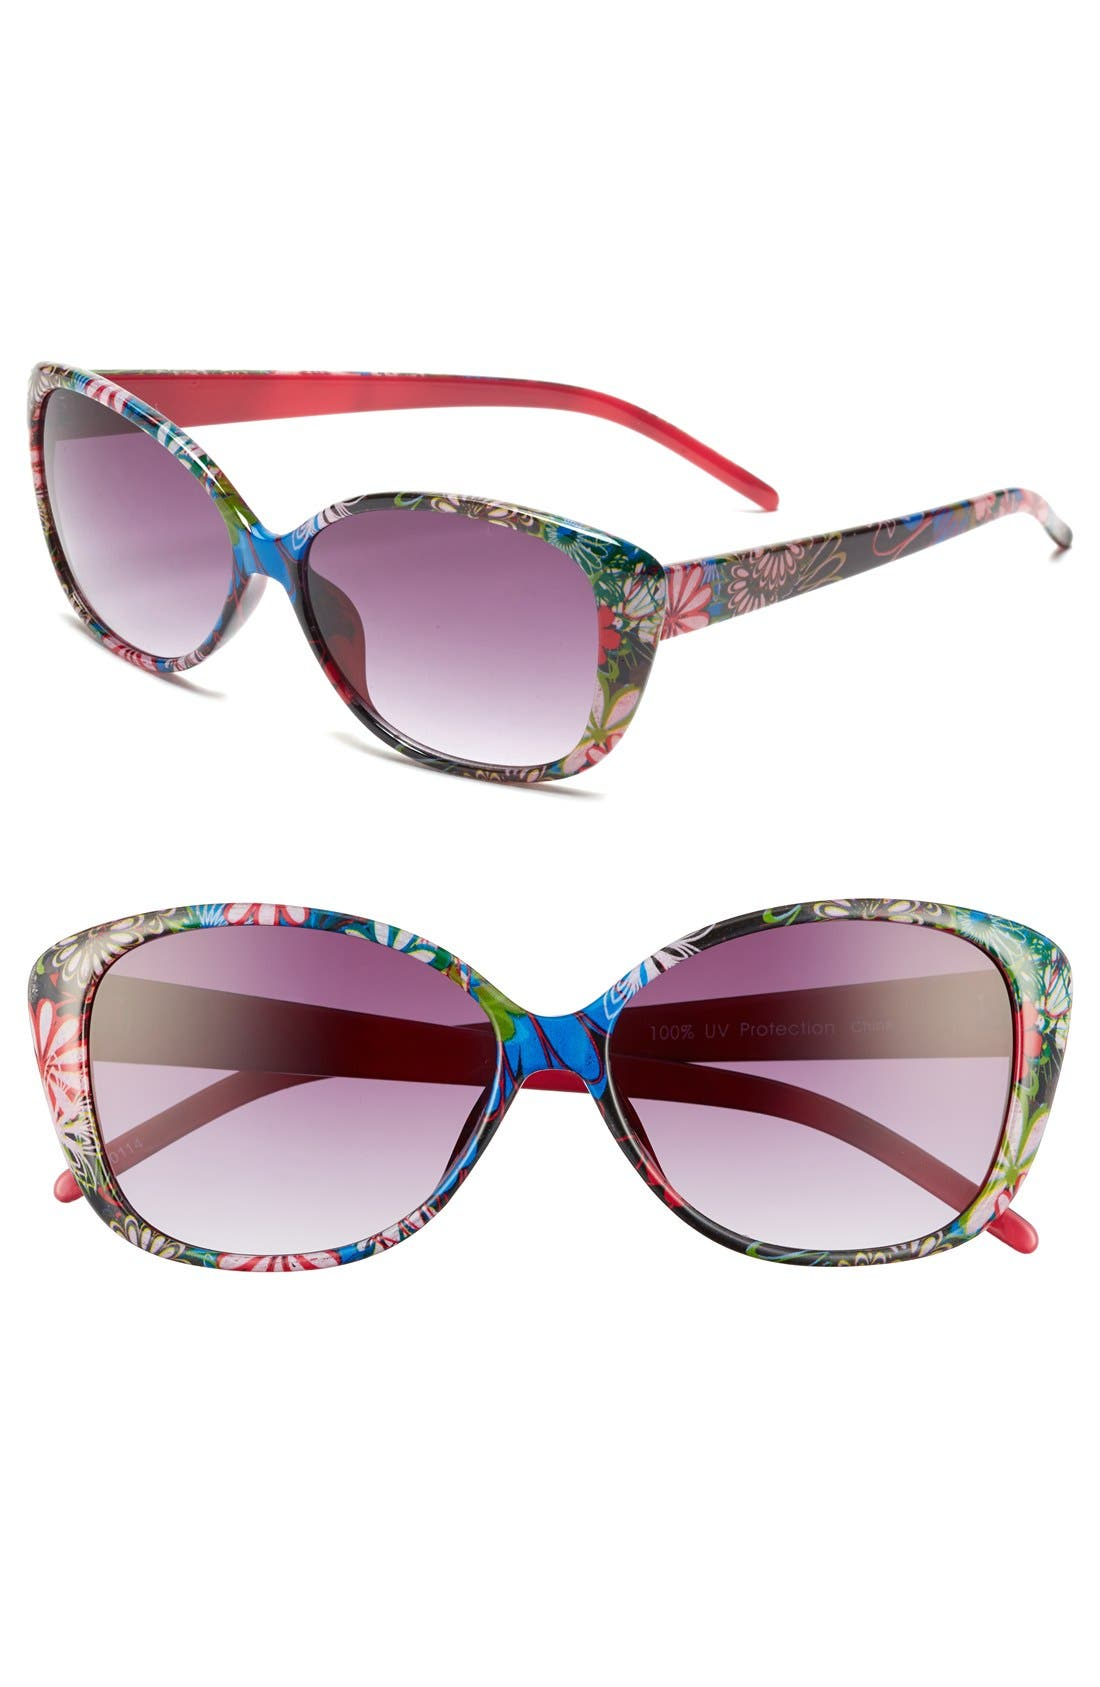 Alternate Image 1 Selected - Fantas Eyes 'Sunset Strip' Sunglasses (Girls)